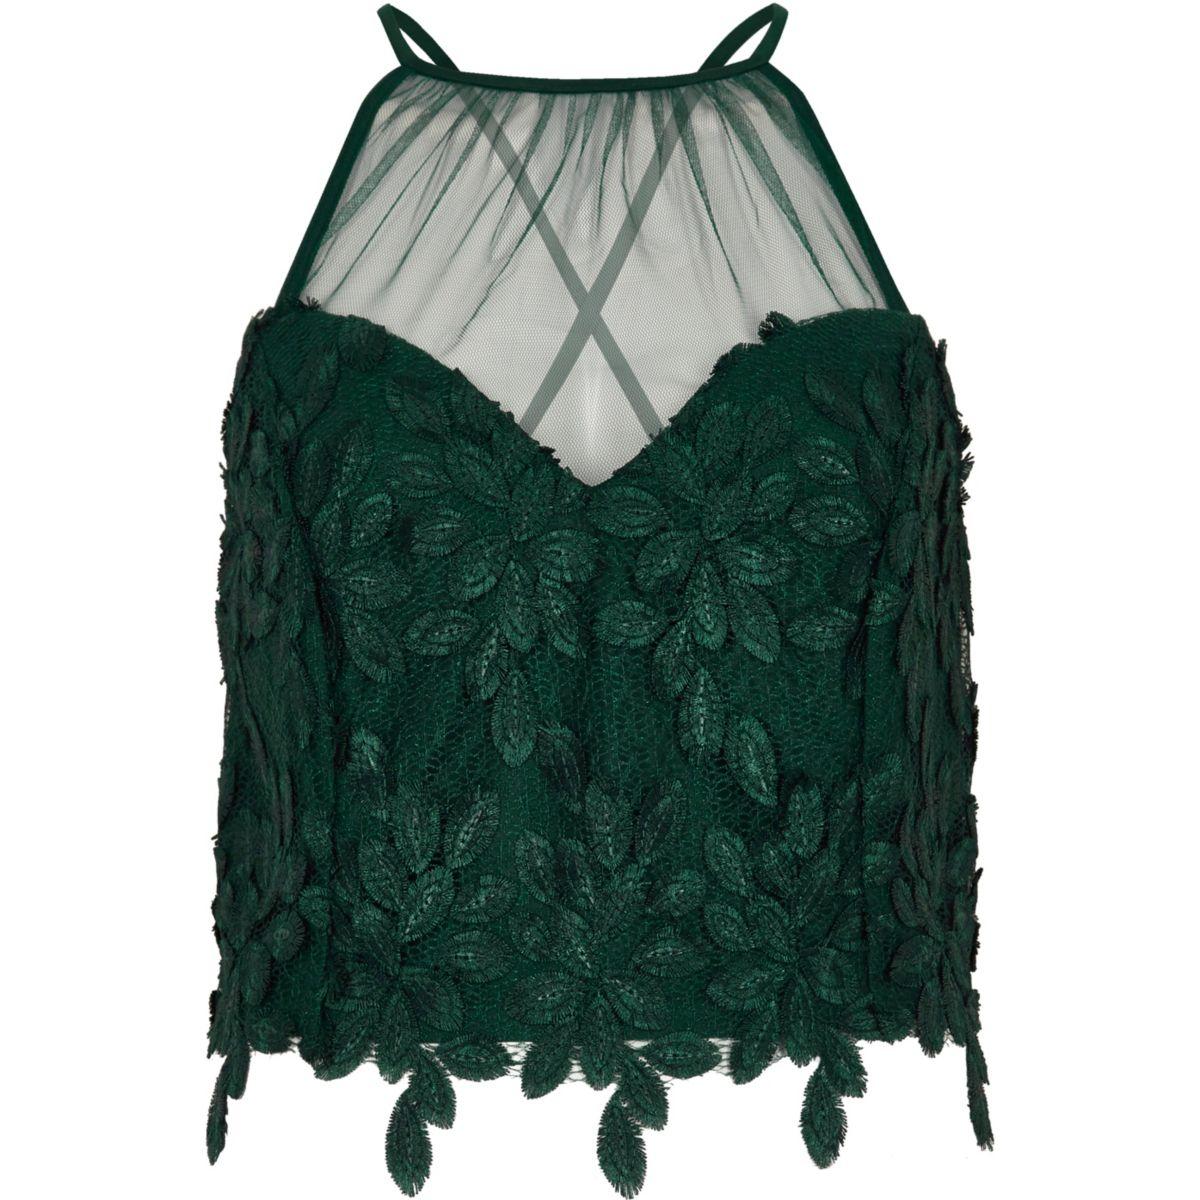 Green leaf lace mesh insert bralette